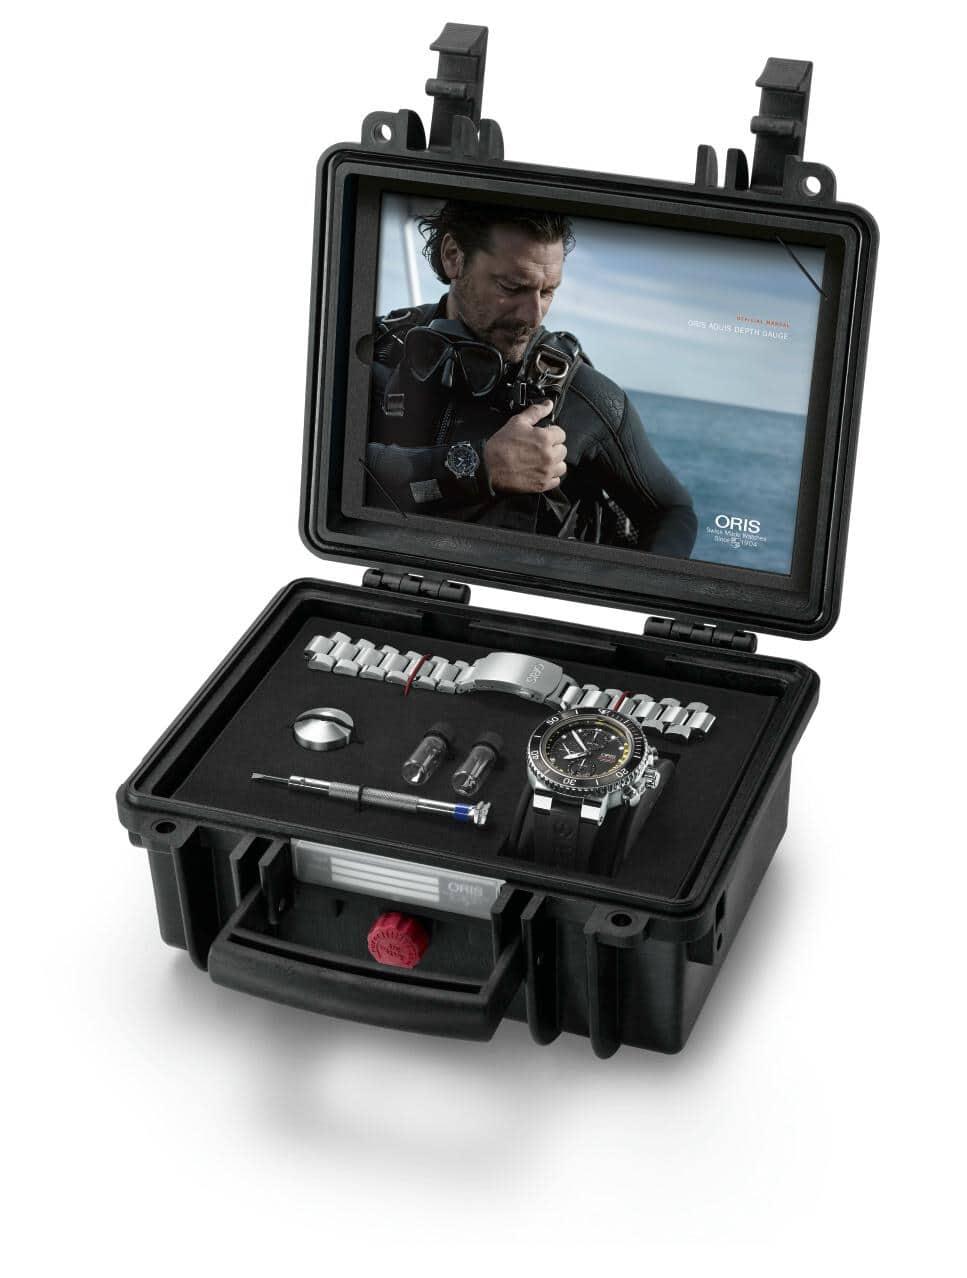 Oris Aquis Depth Gauge Chronograph Waterproof Case